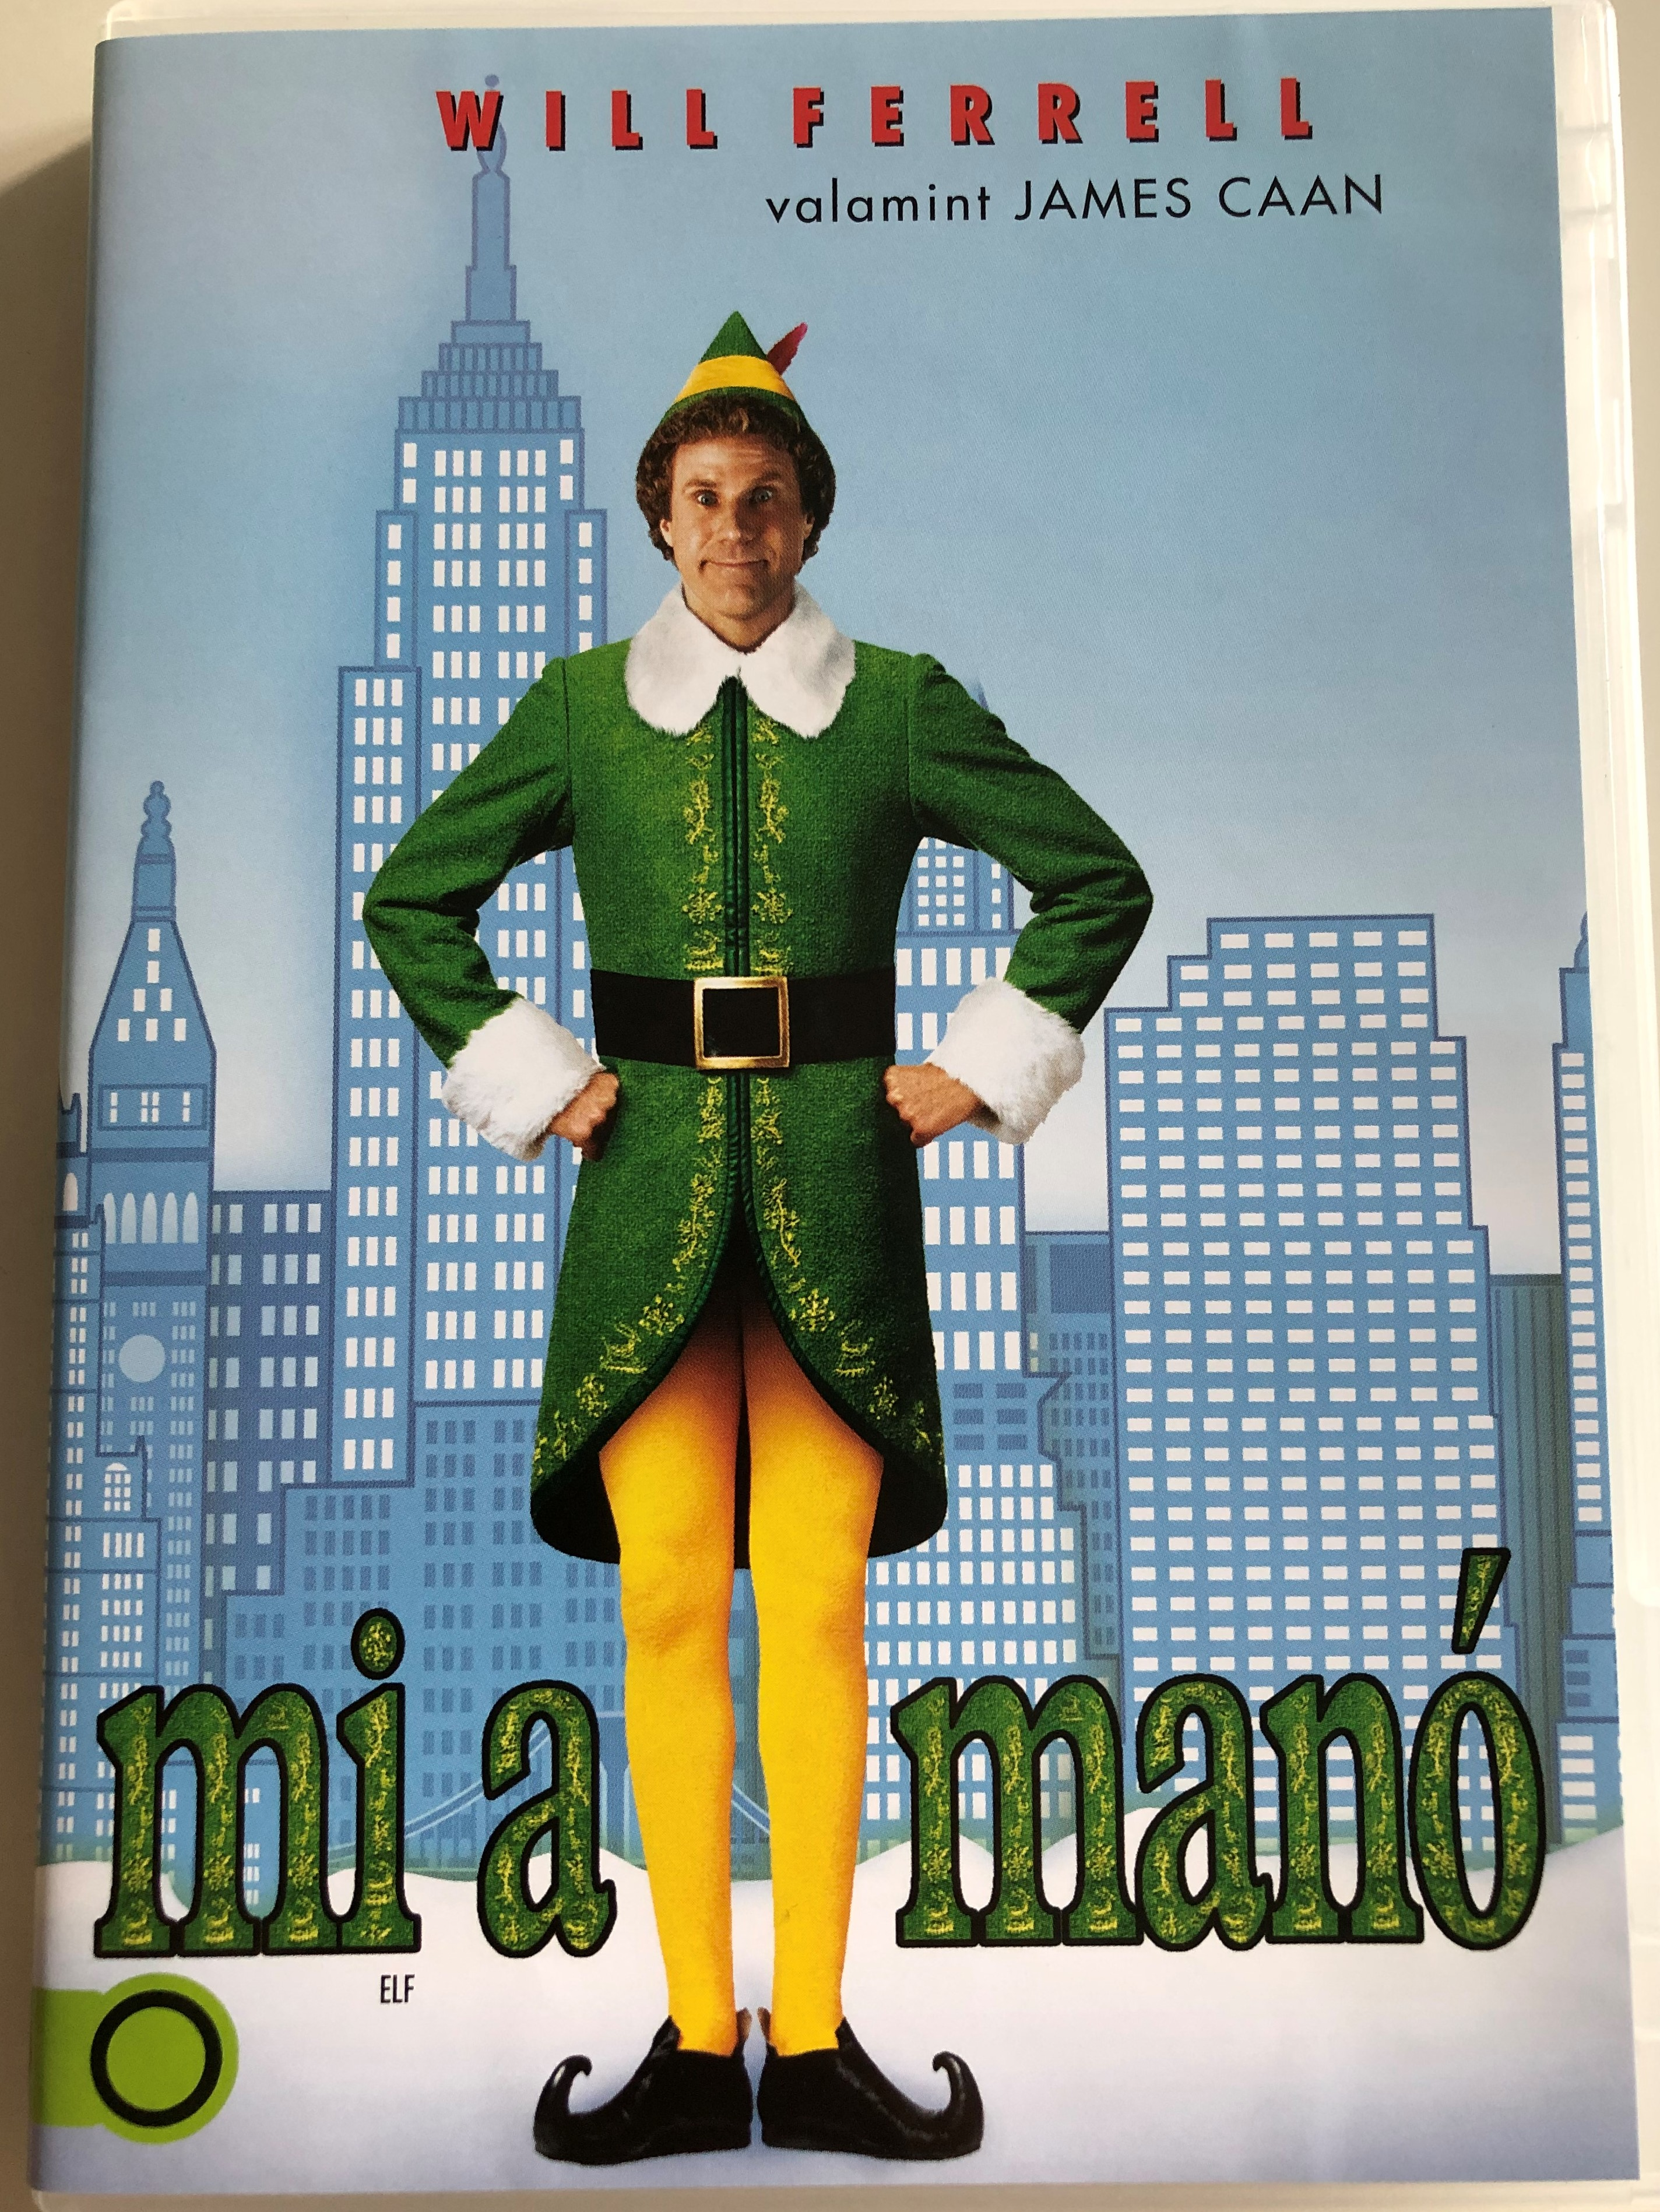 elf-dvd-2003-mi-a-man-directed-by-jon-favreau-starring-will-ferrell-james-caan-zooey-deschanel-mary-steenburgen-daniel-tay-bob-newhart-edward-asner-1-.jpg